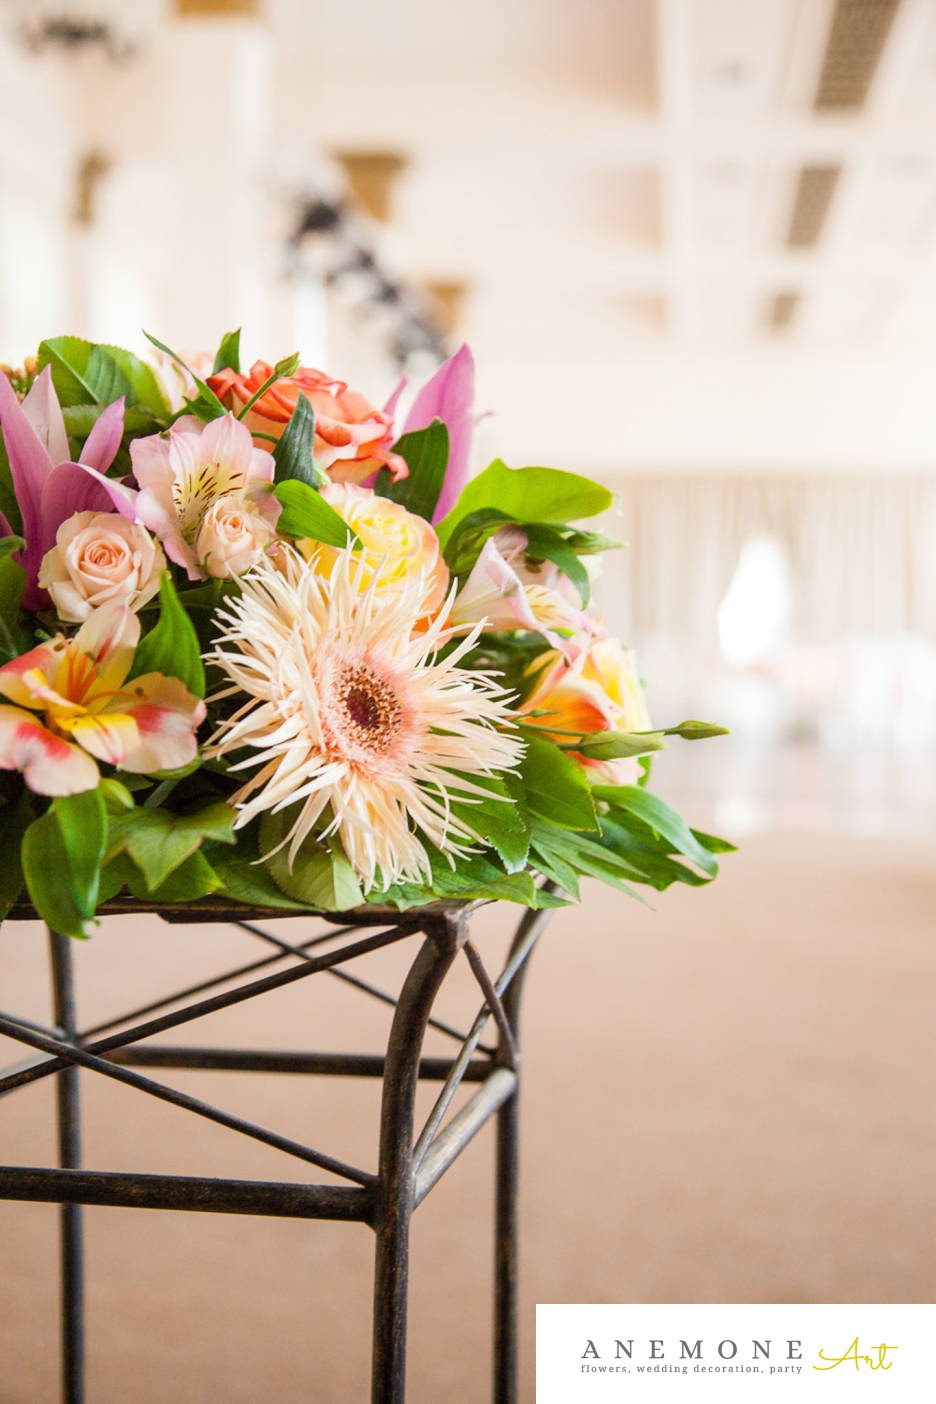 Poza, foto cu Flori de nunta alstroemeria, decor sala, gerbera, magnolia, mini-rosa, multicolor, trandafiri in Arad, Timisoara, Oradea (wedding flowers, bouquets) nunta Arad, Timisoara, Oradea